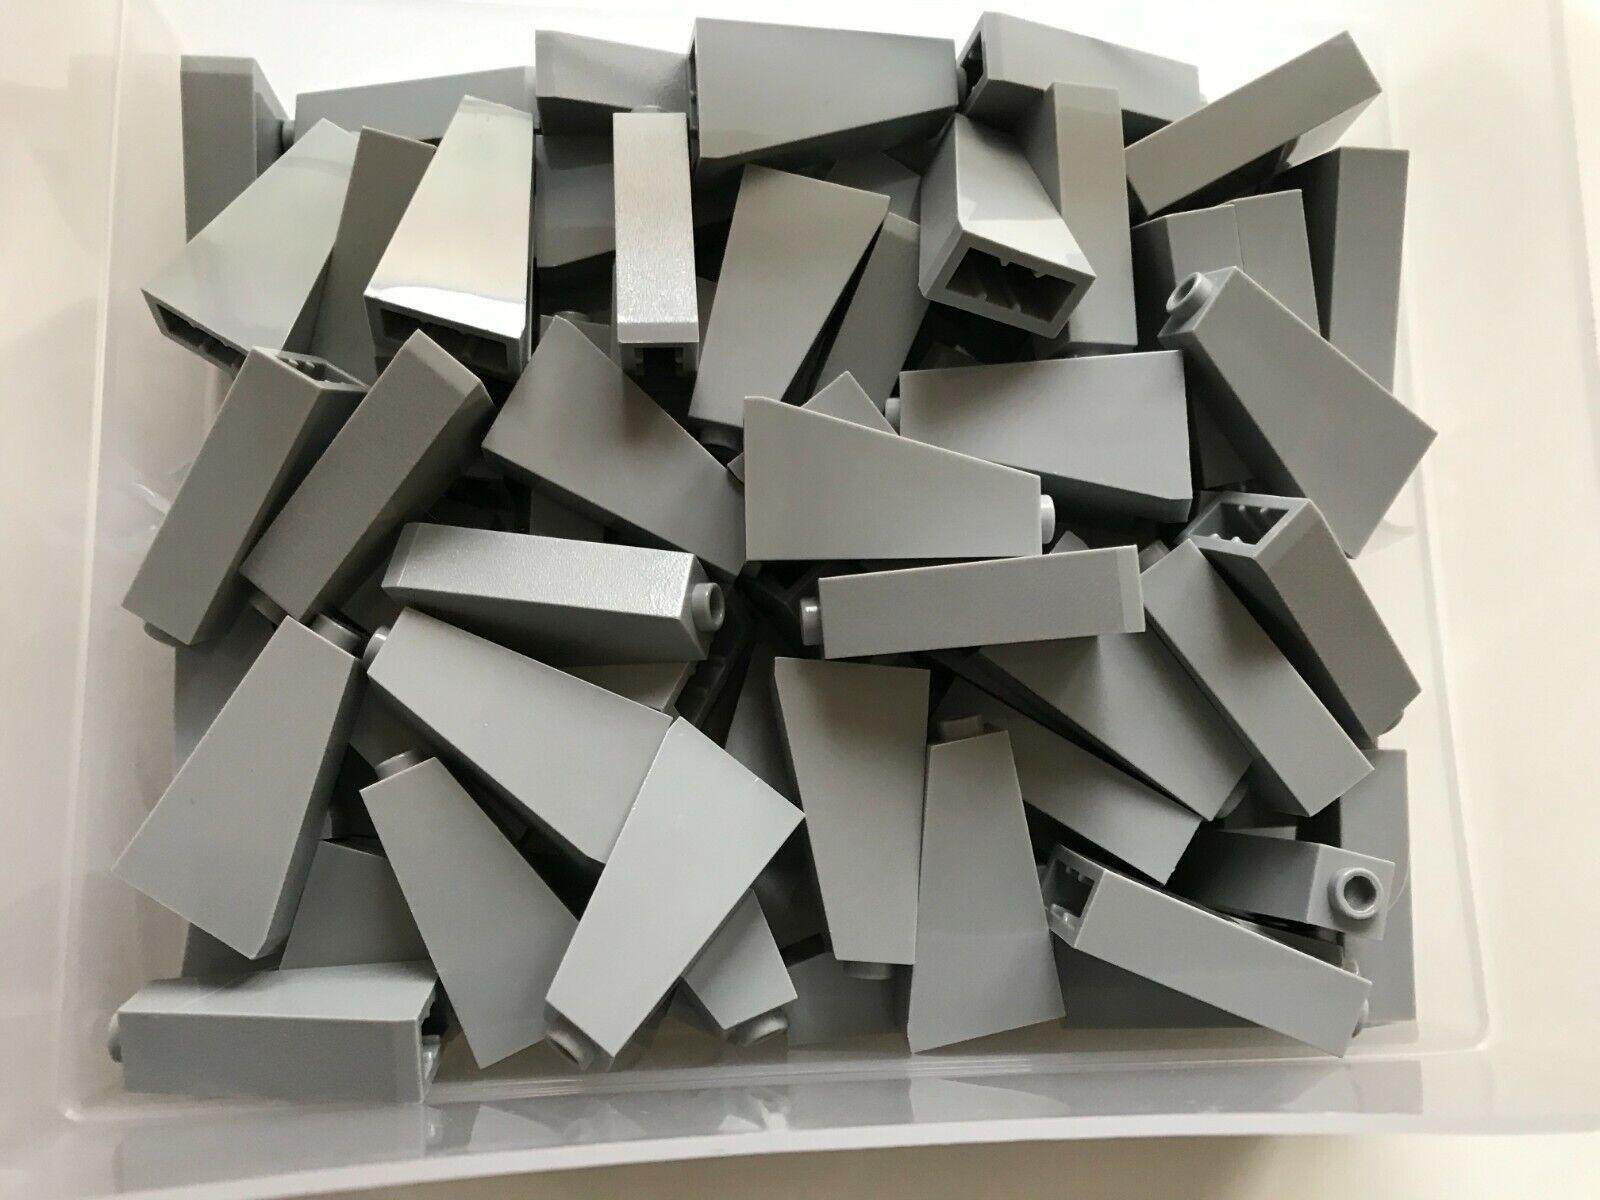 5 # Lego Retreat 2x6 Engine x2.33 Old Dark Grey 3545 3440 42073cx2